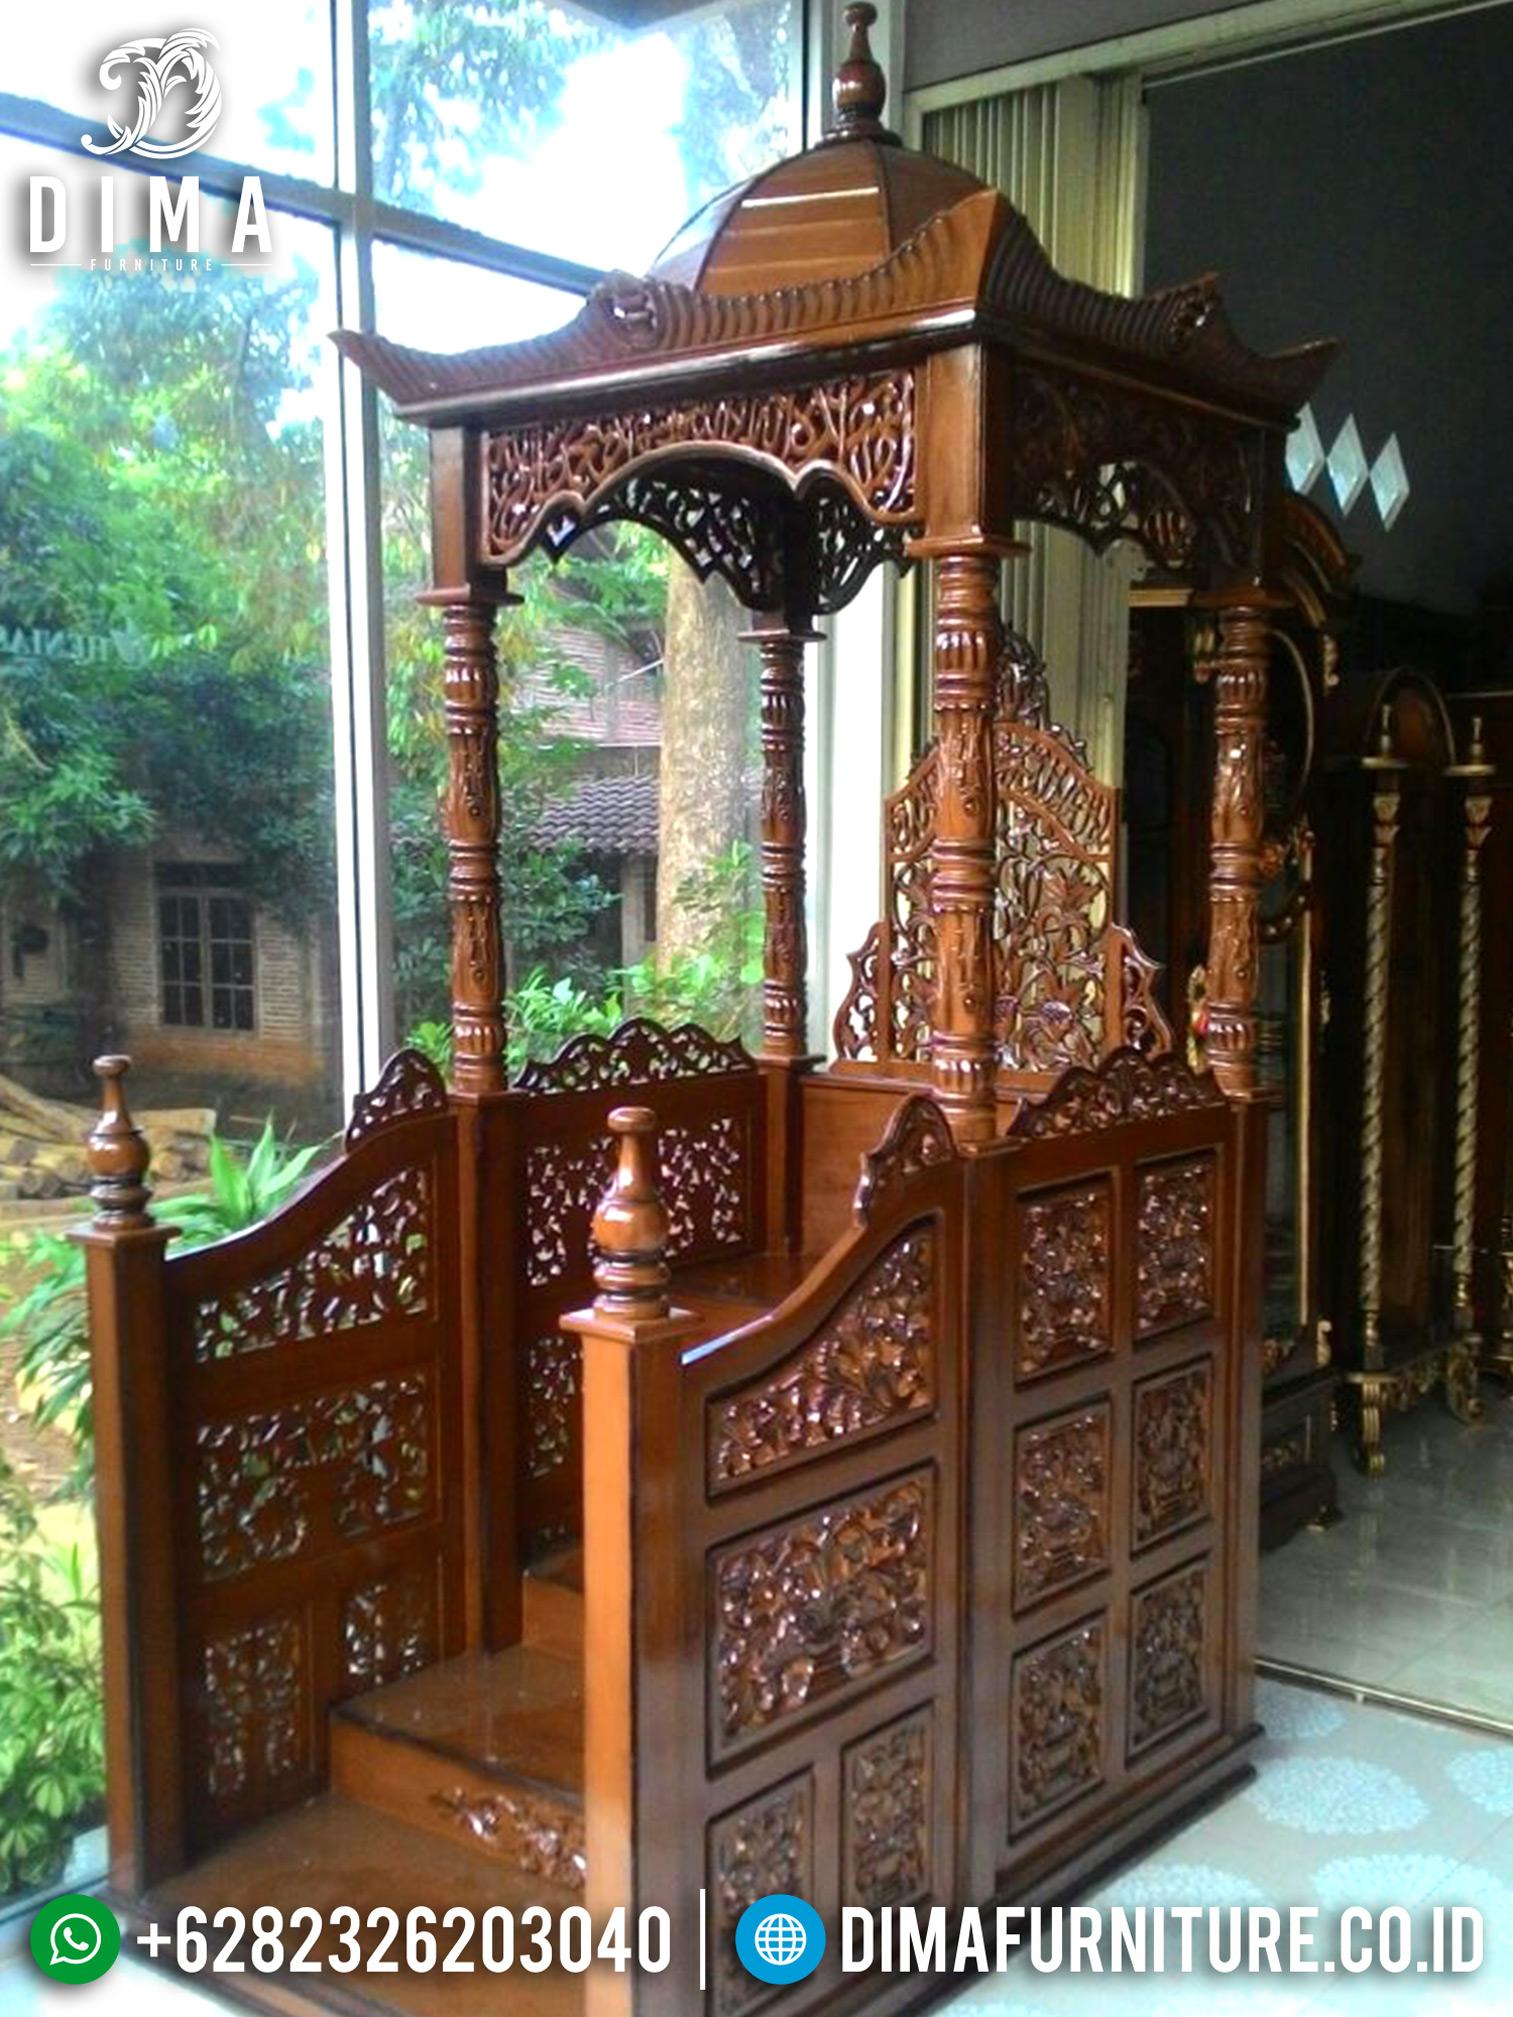 Mebel Jati Jepara, Mimbar Masjid Jati, Mimbar Jati Ukir Jepara DF-0716